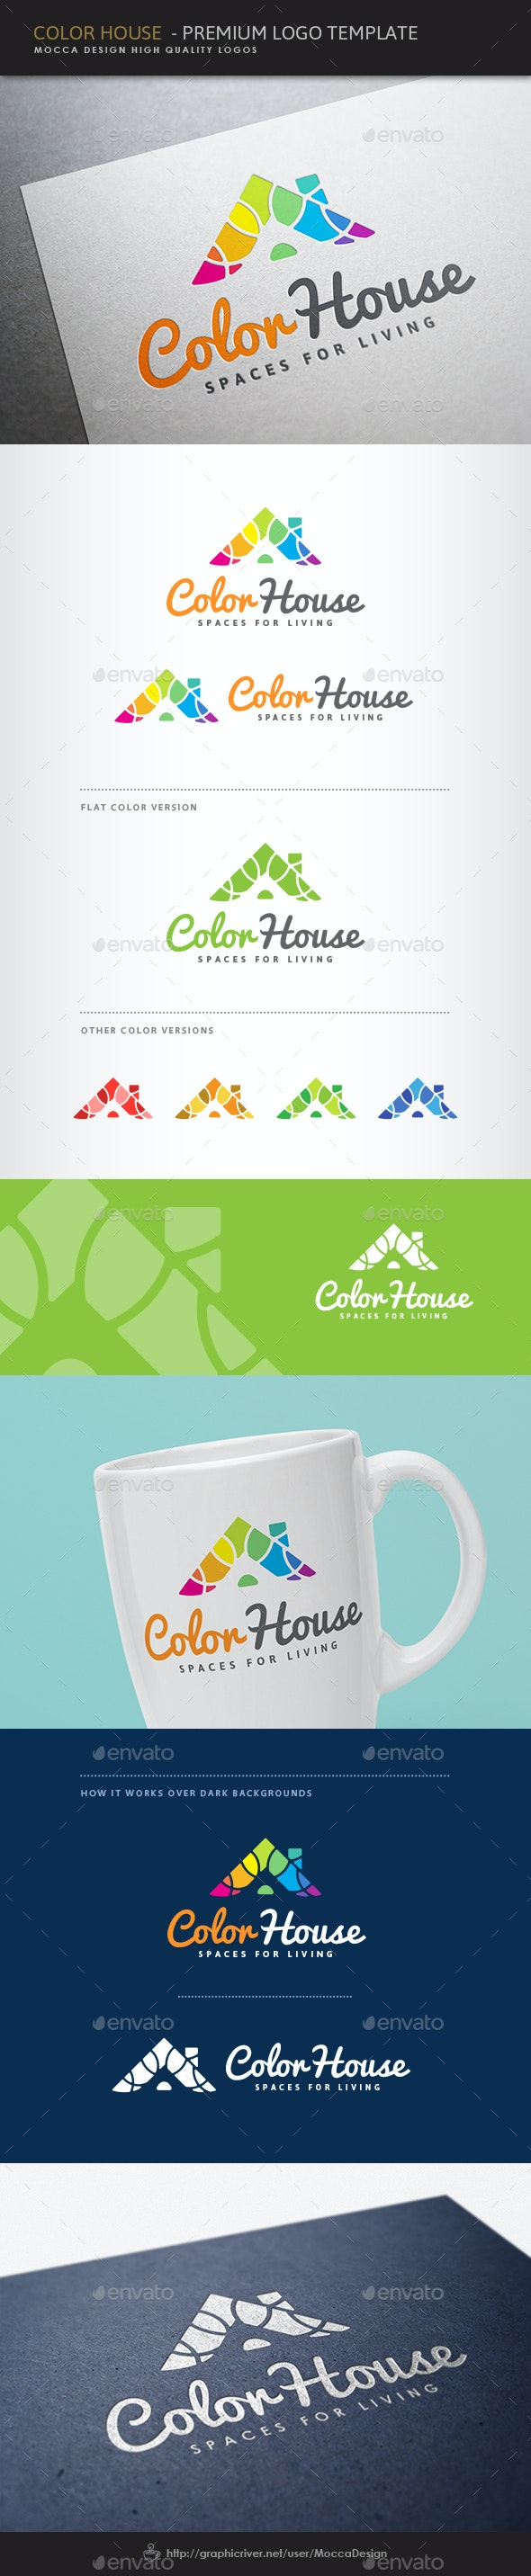 Color House Exclusive Logo - Buildings Logo Templates